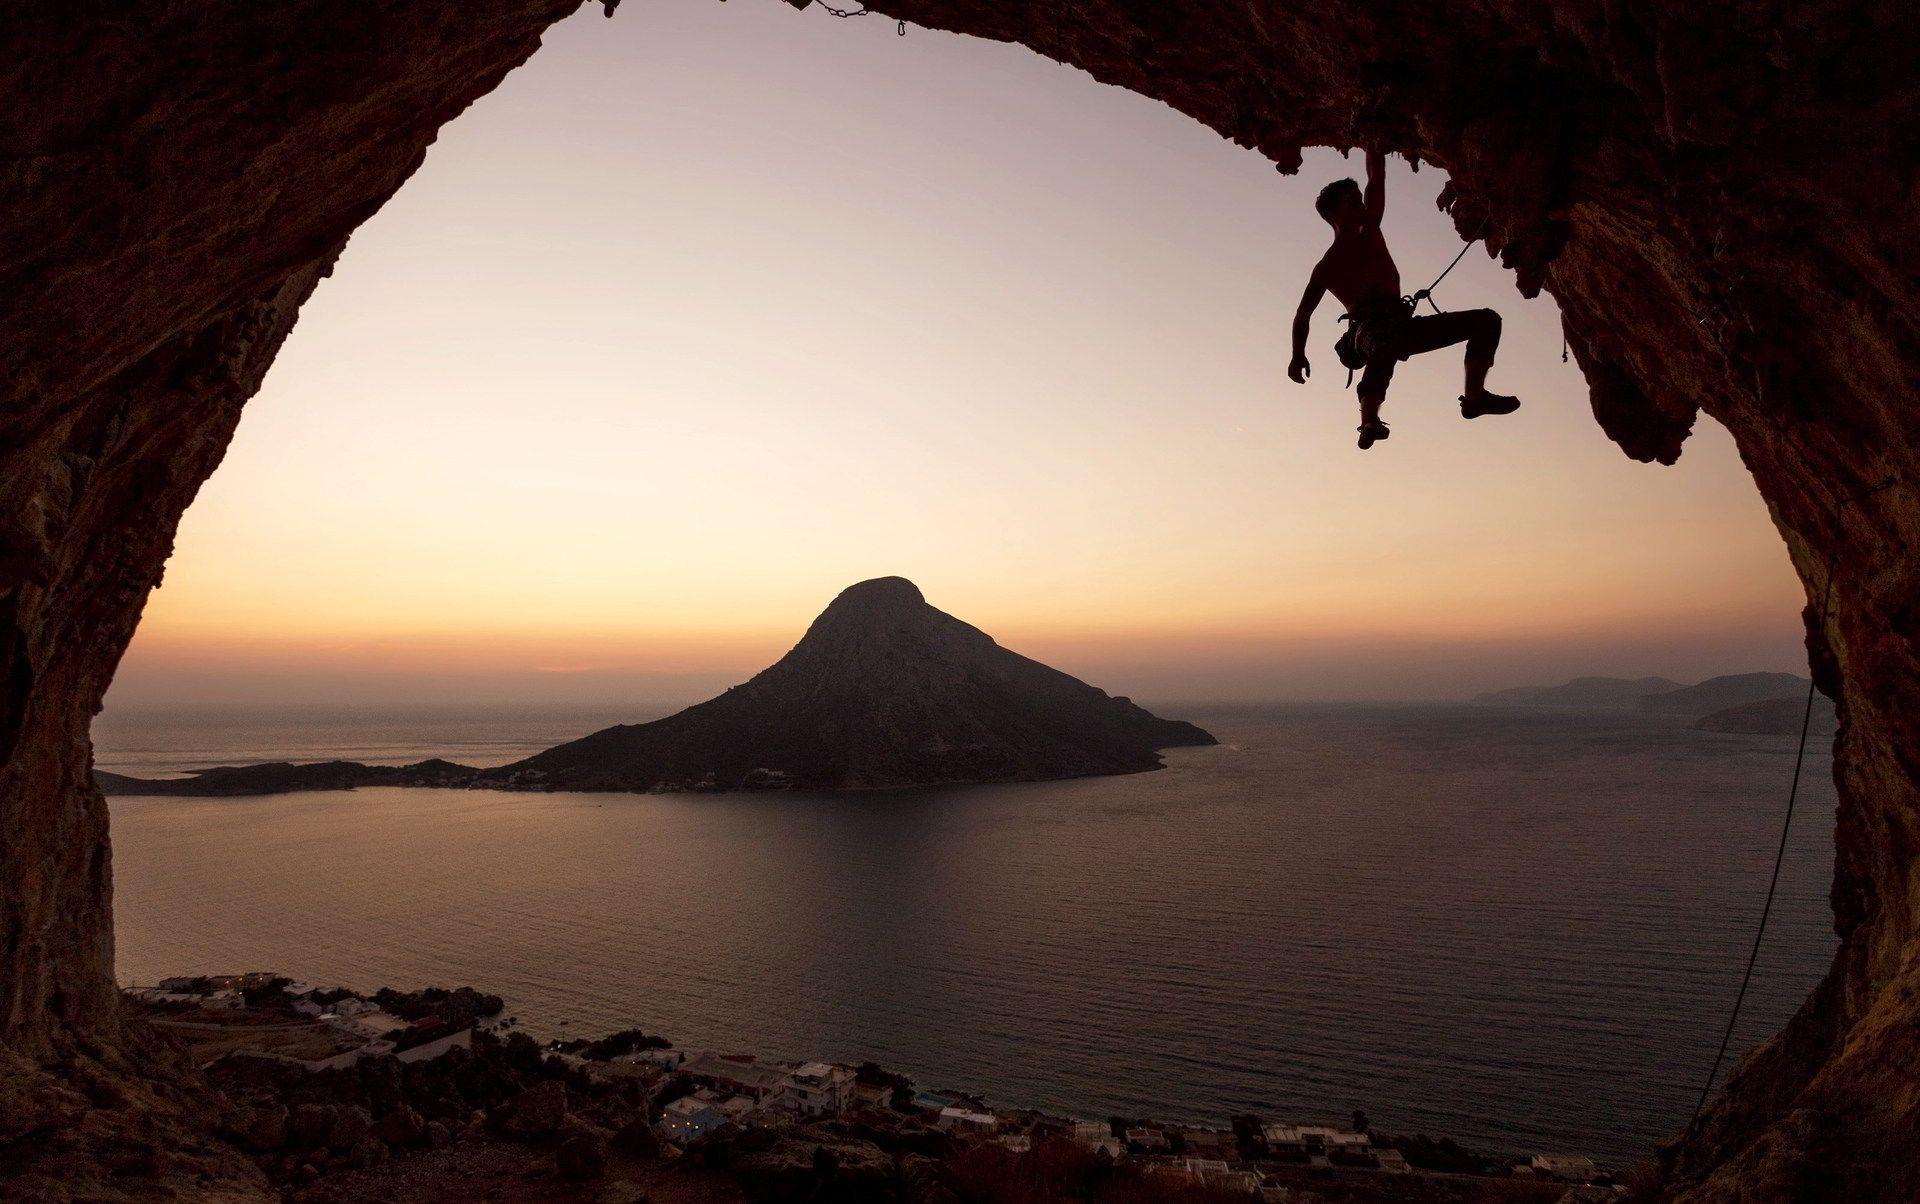 Rock Climbing Wallpapers - Wallpaper Cave